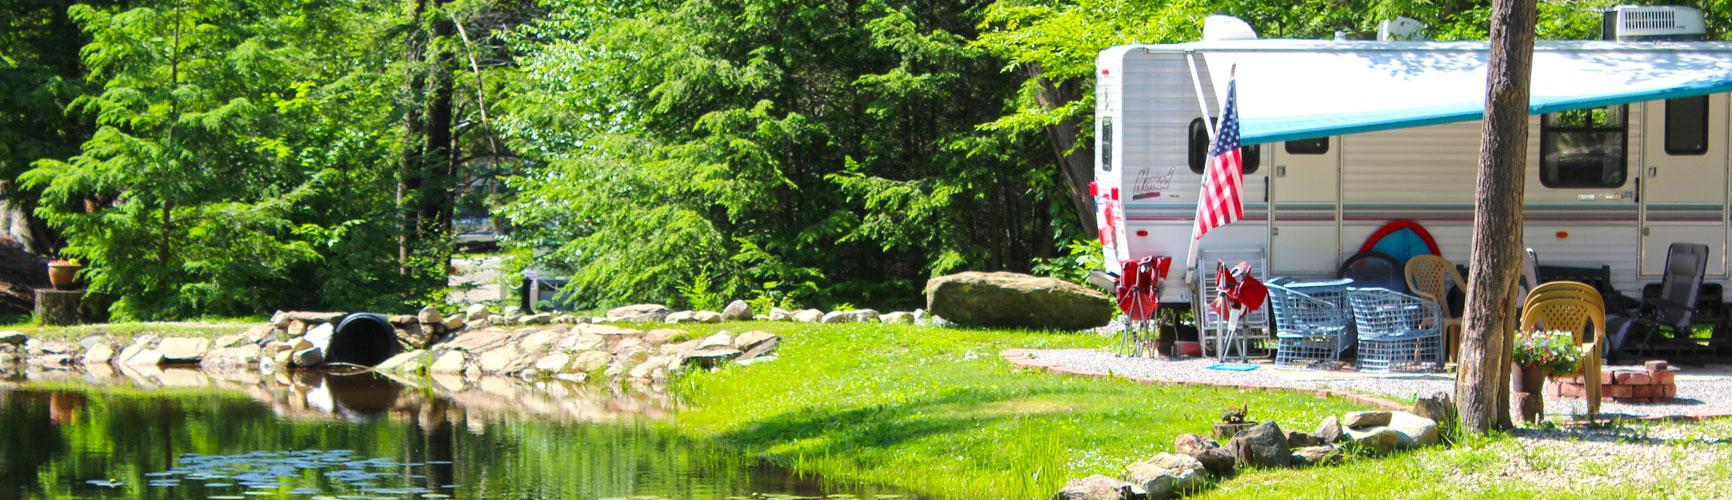 banner-pond